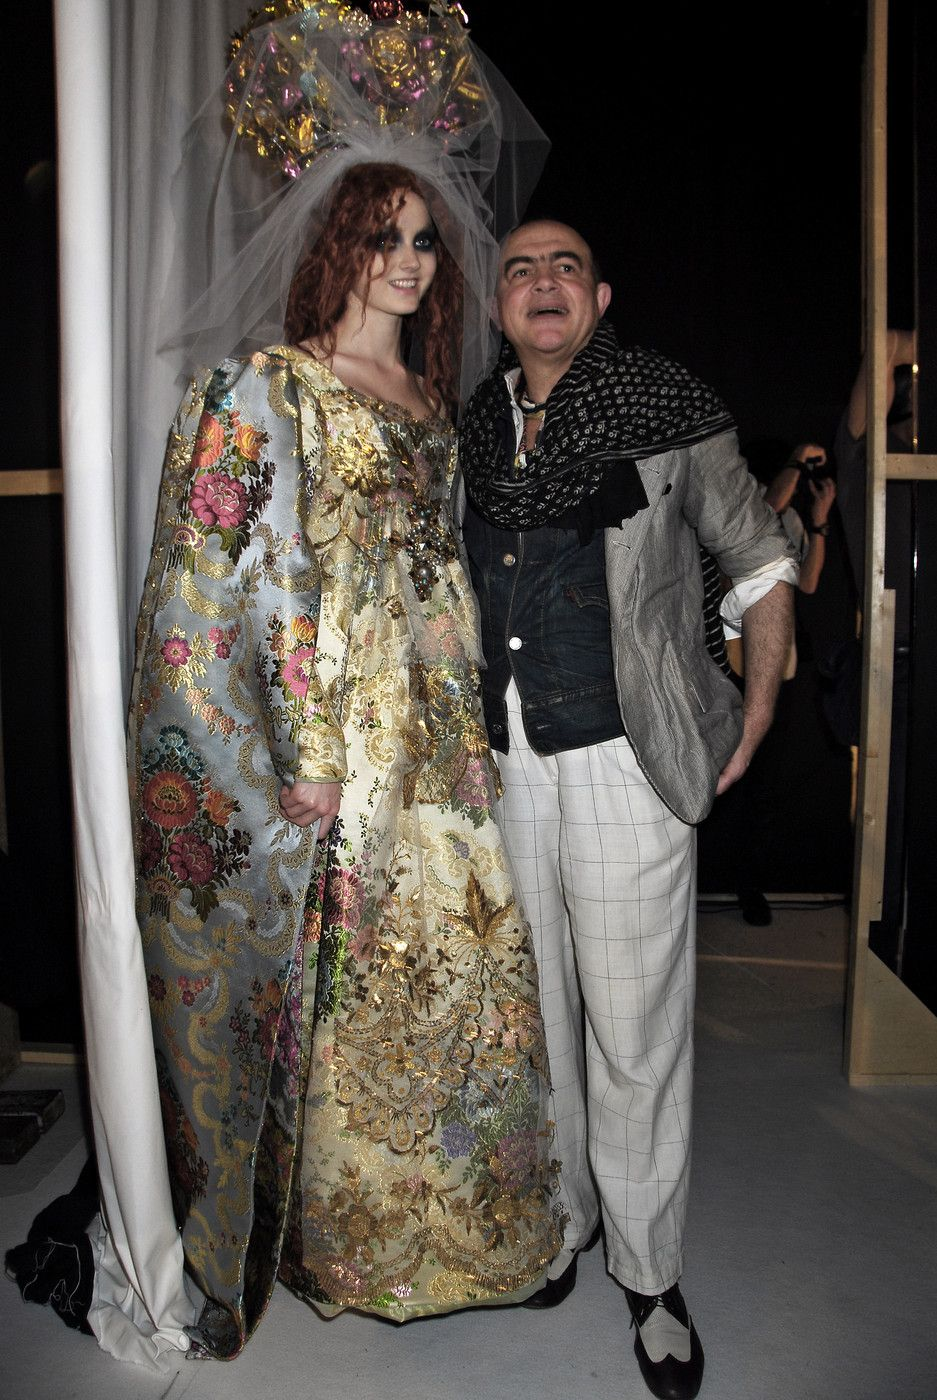 Wedding Dresses-Christian Lacroix-Luxe-Fashion-Elegance-Haute Couture-Bride /Source stylebistro ...